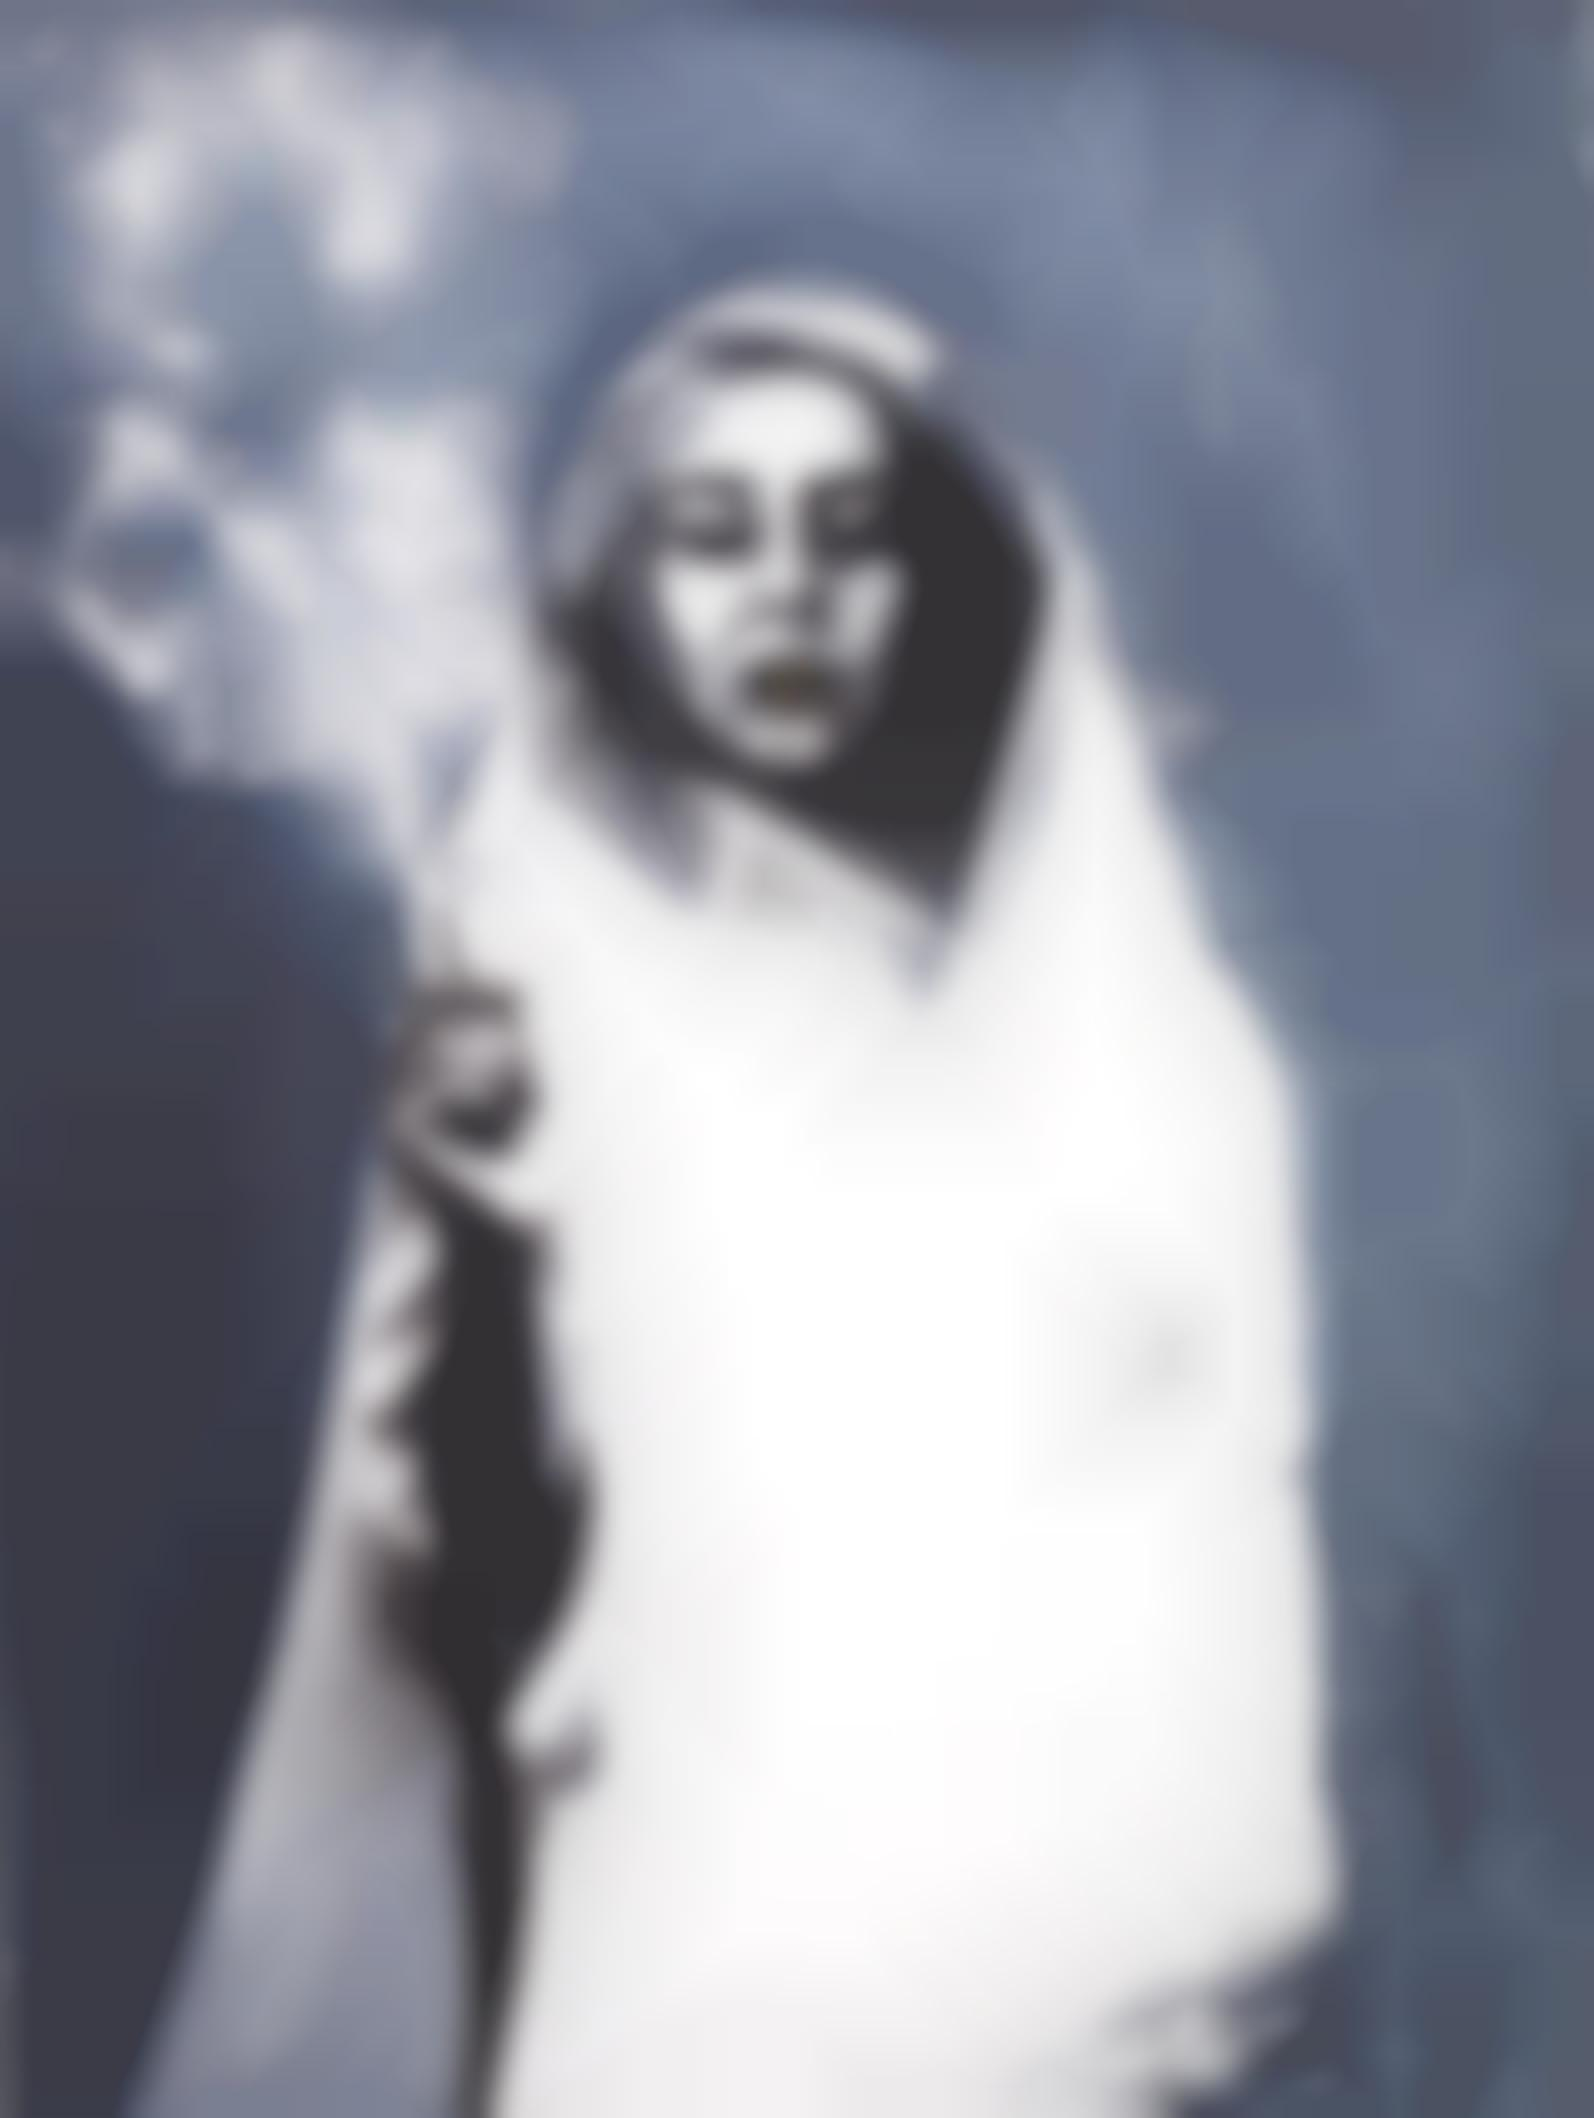 Afshin Pirhashemi-Femme A La Cigarette-2007